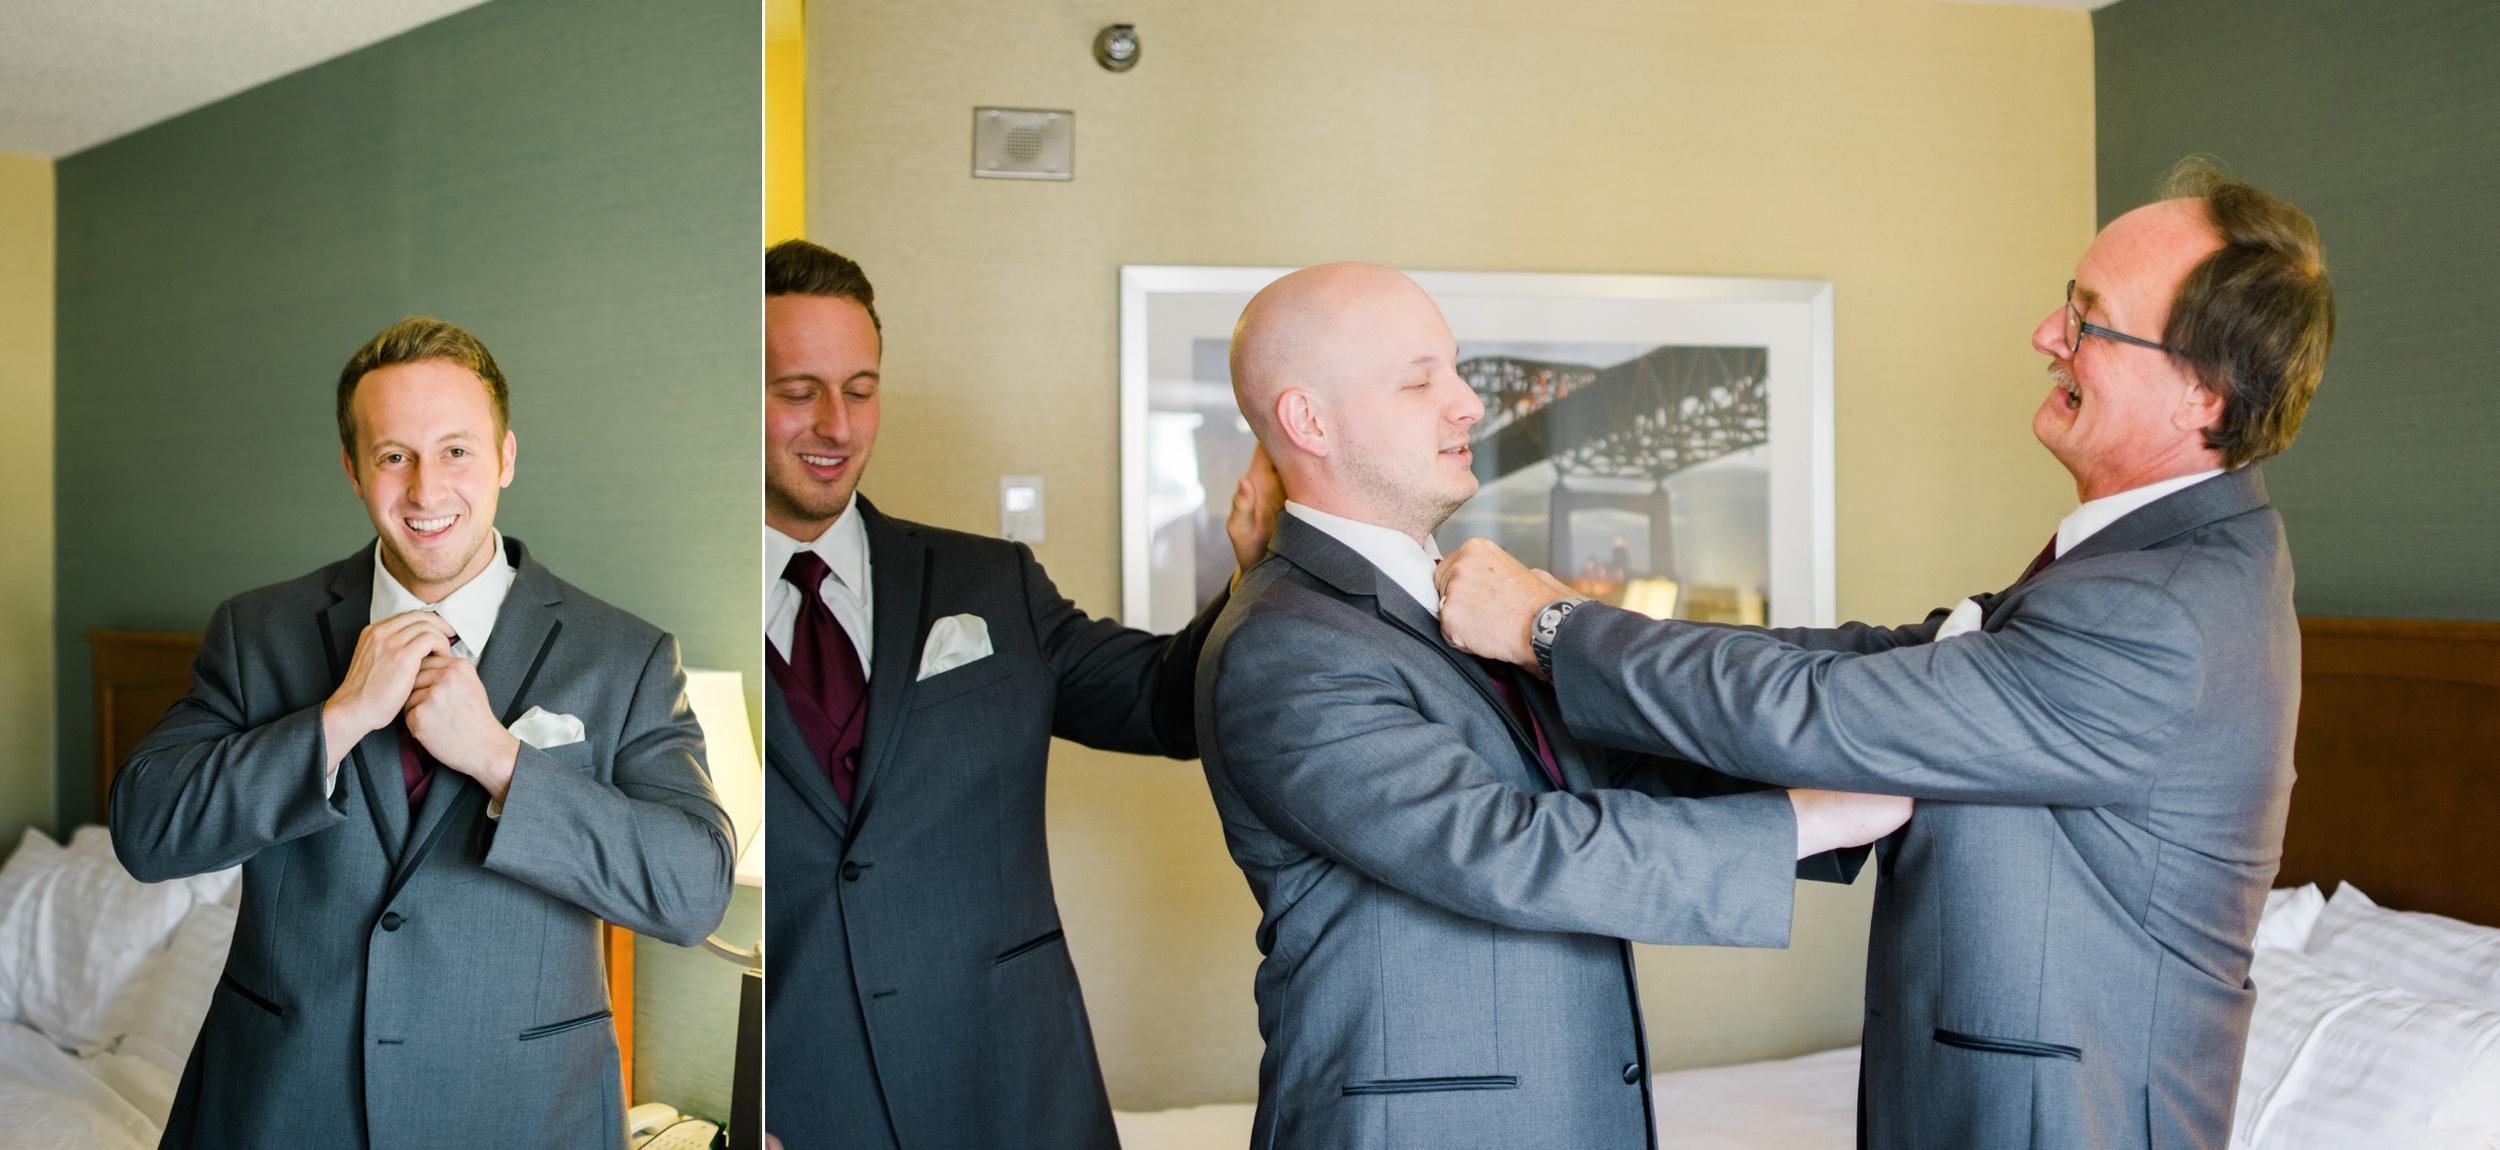 Glensheen Mansion Wedding | Duluth, MN Wedding Photographer_0458.jpg